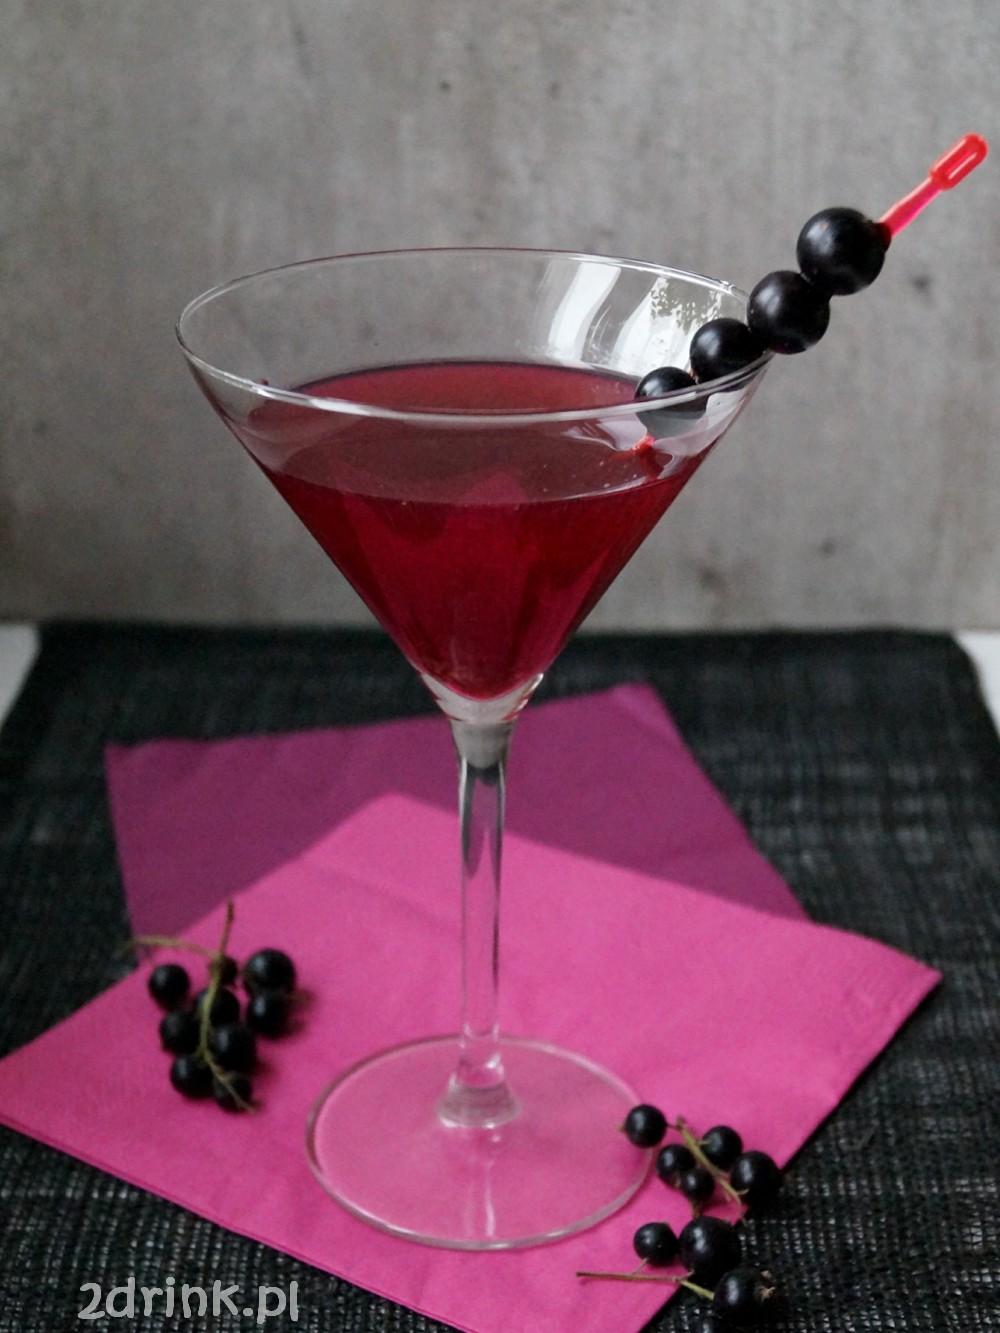 Blackcurrant Martini